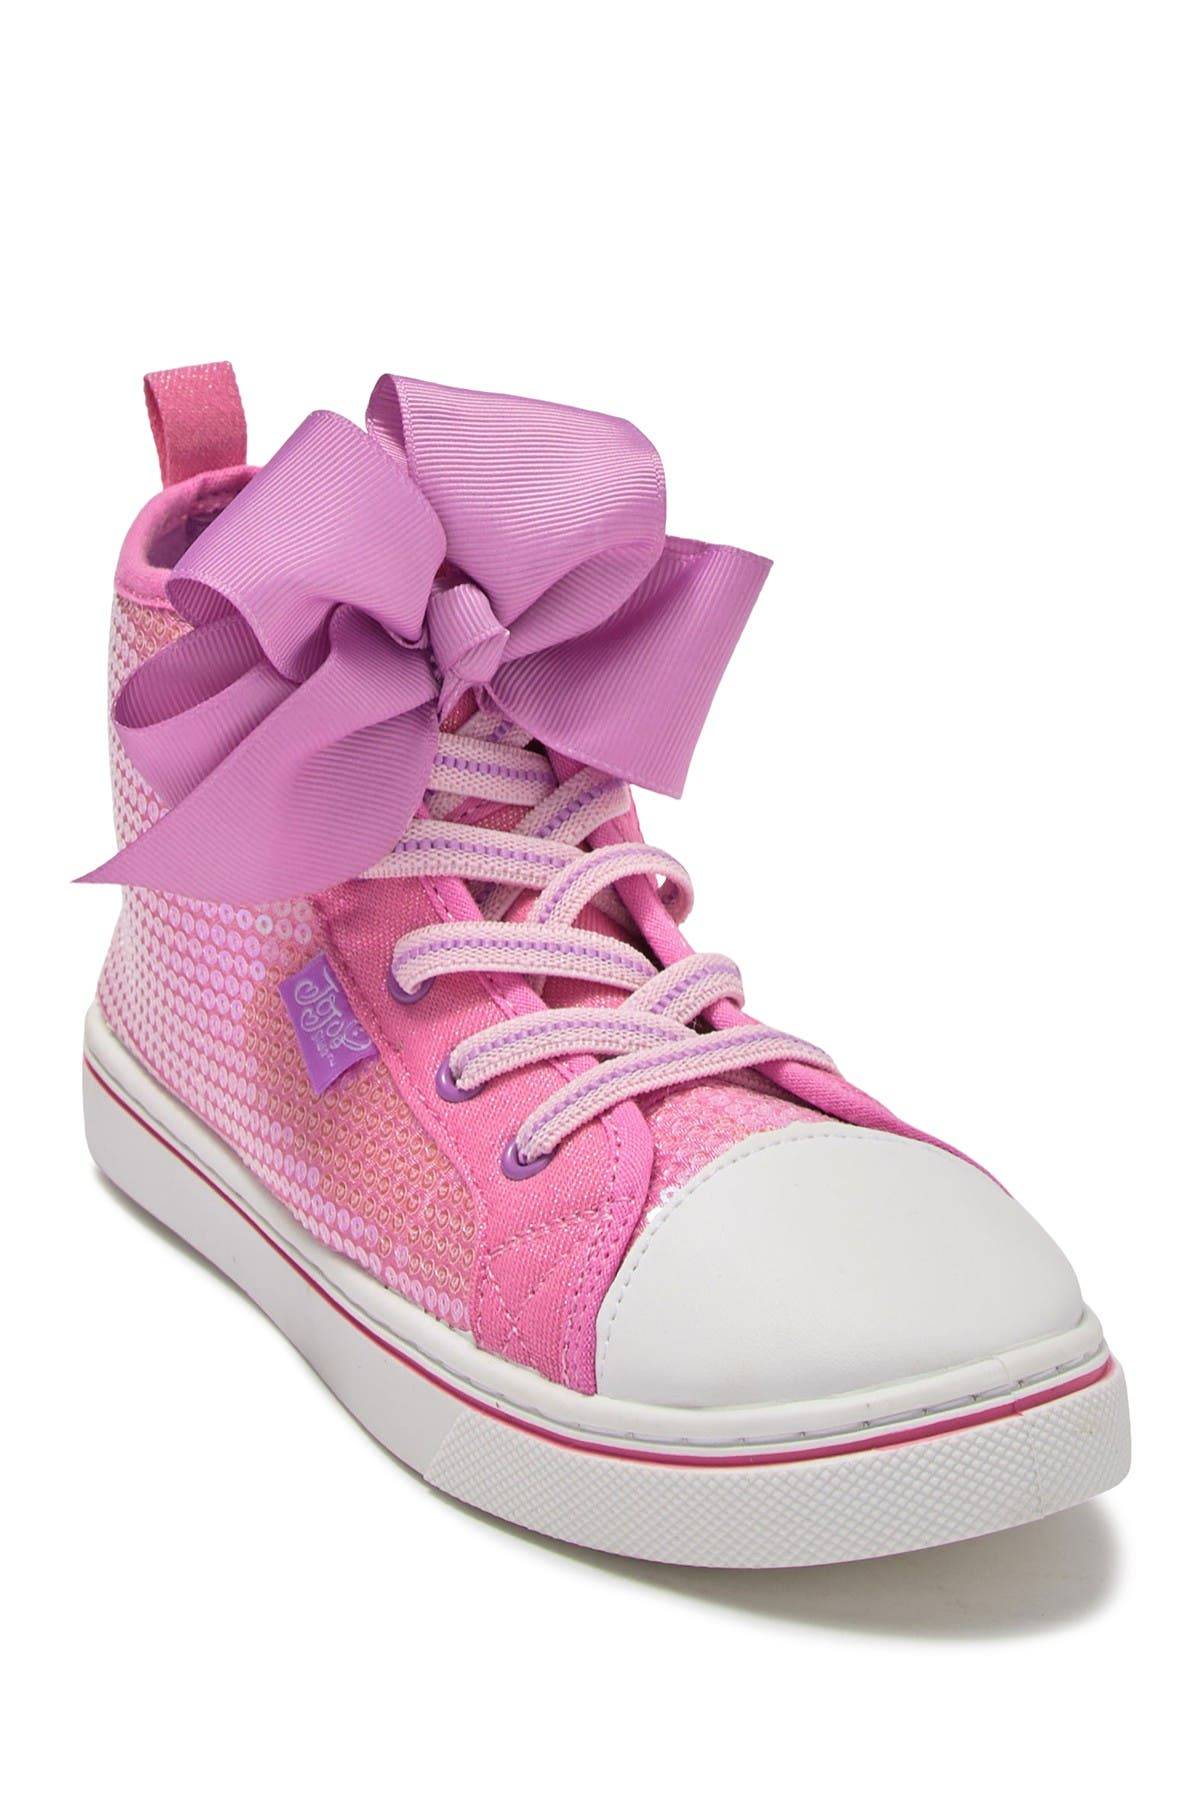 Jojo Siwa Sequin High Top Sneaker